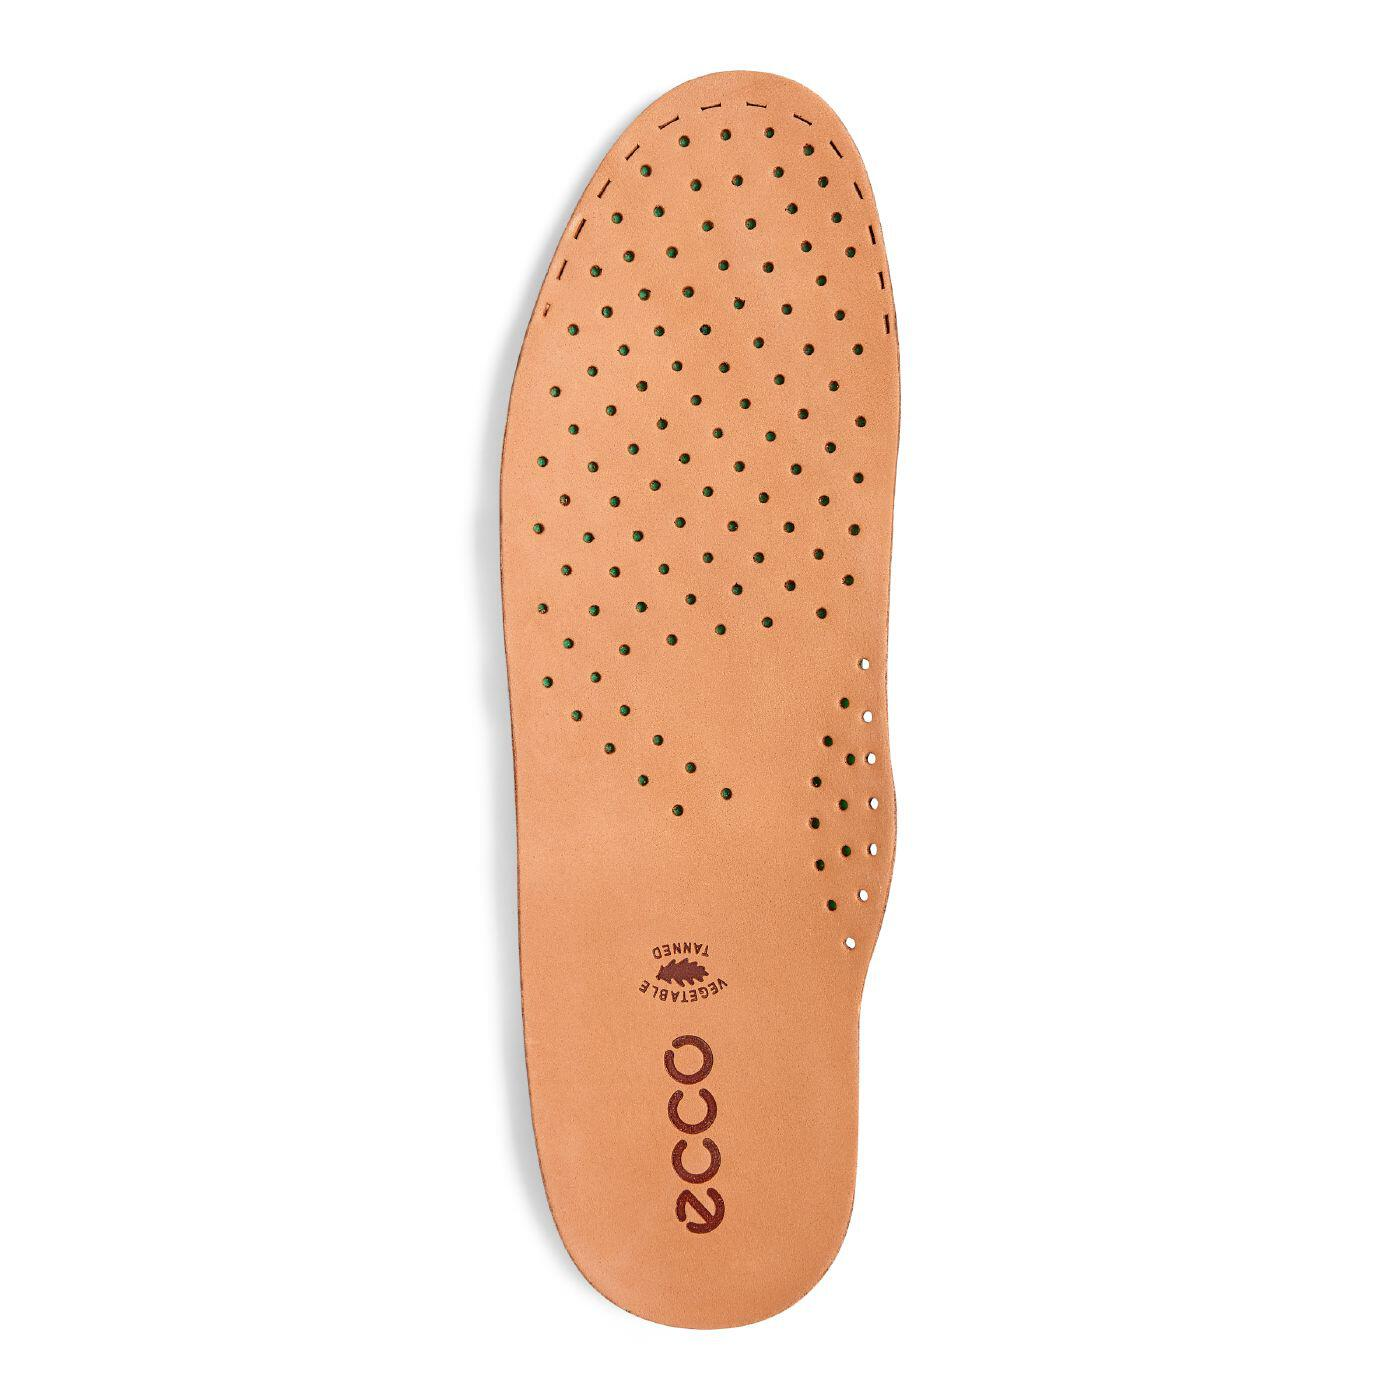 ECCO Comfort Everyday Men's Insole